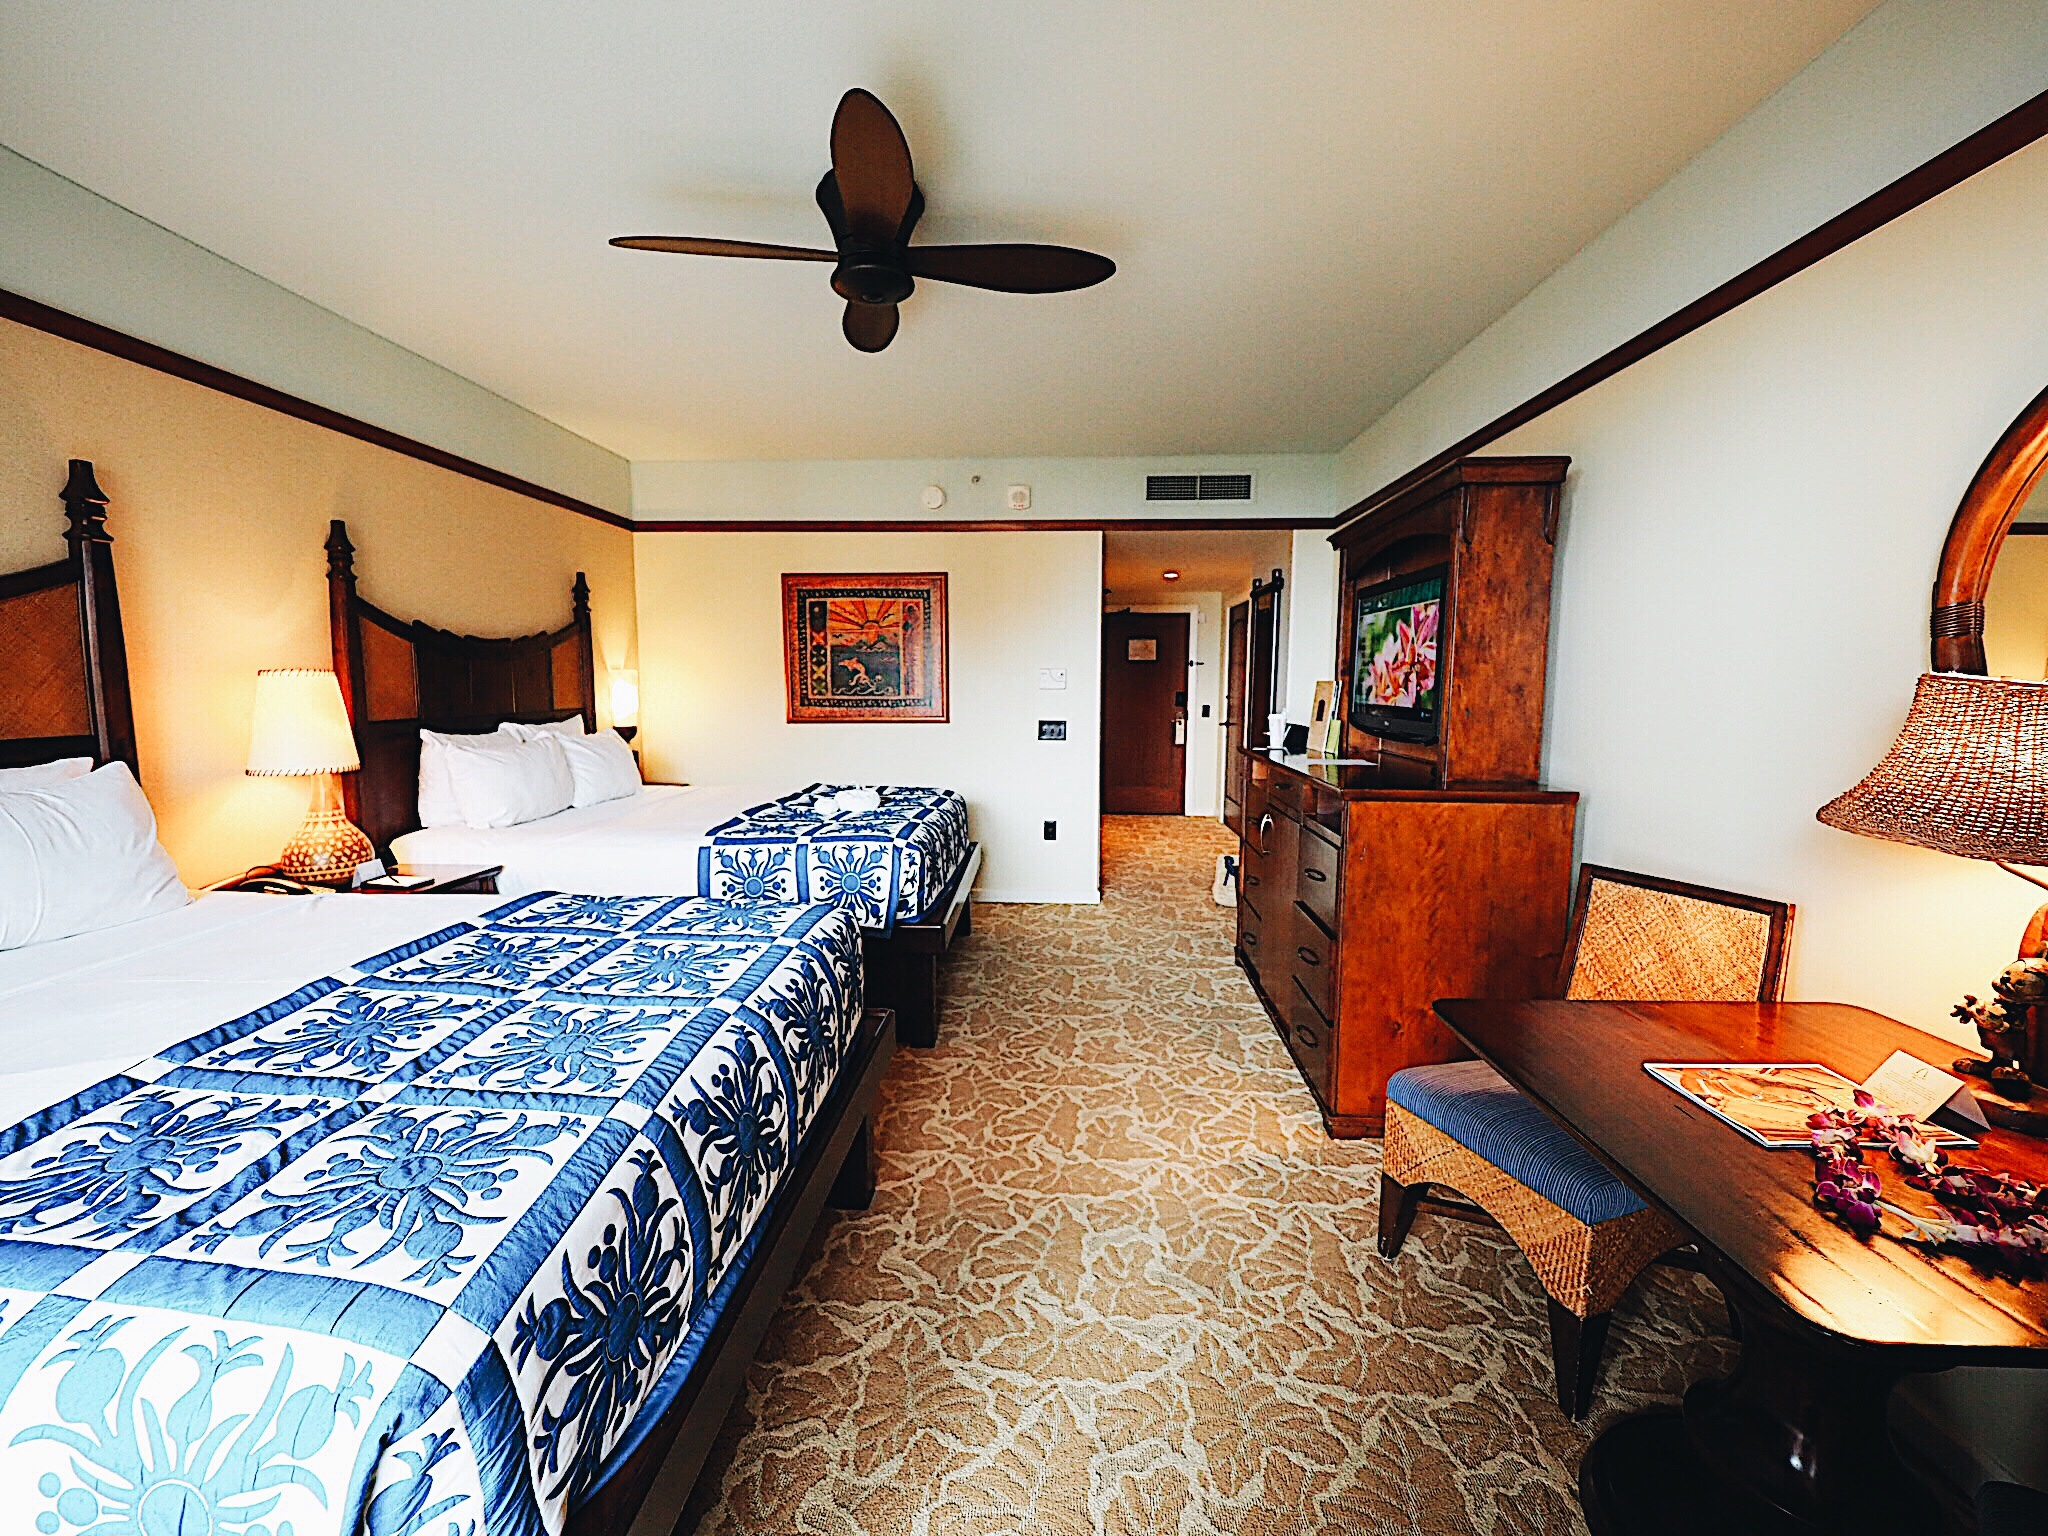 c8edf9ad 86b4 4127 85f6 42fc99d170bf - Aulani, A Disney Resort & Spa  - 家族で、女子旅で泊まりたい!ディズニーマジックのかかったハワイのリゾート